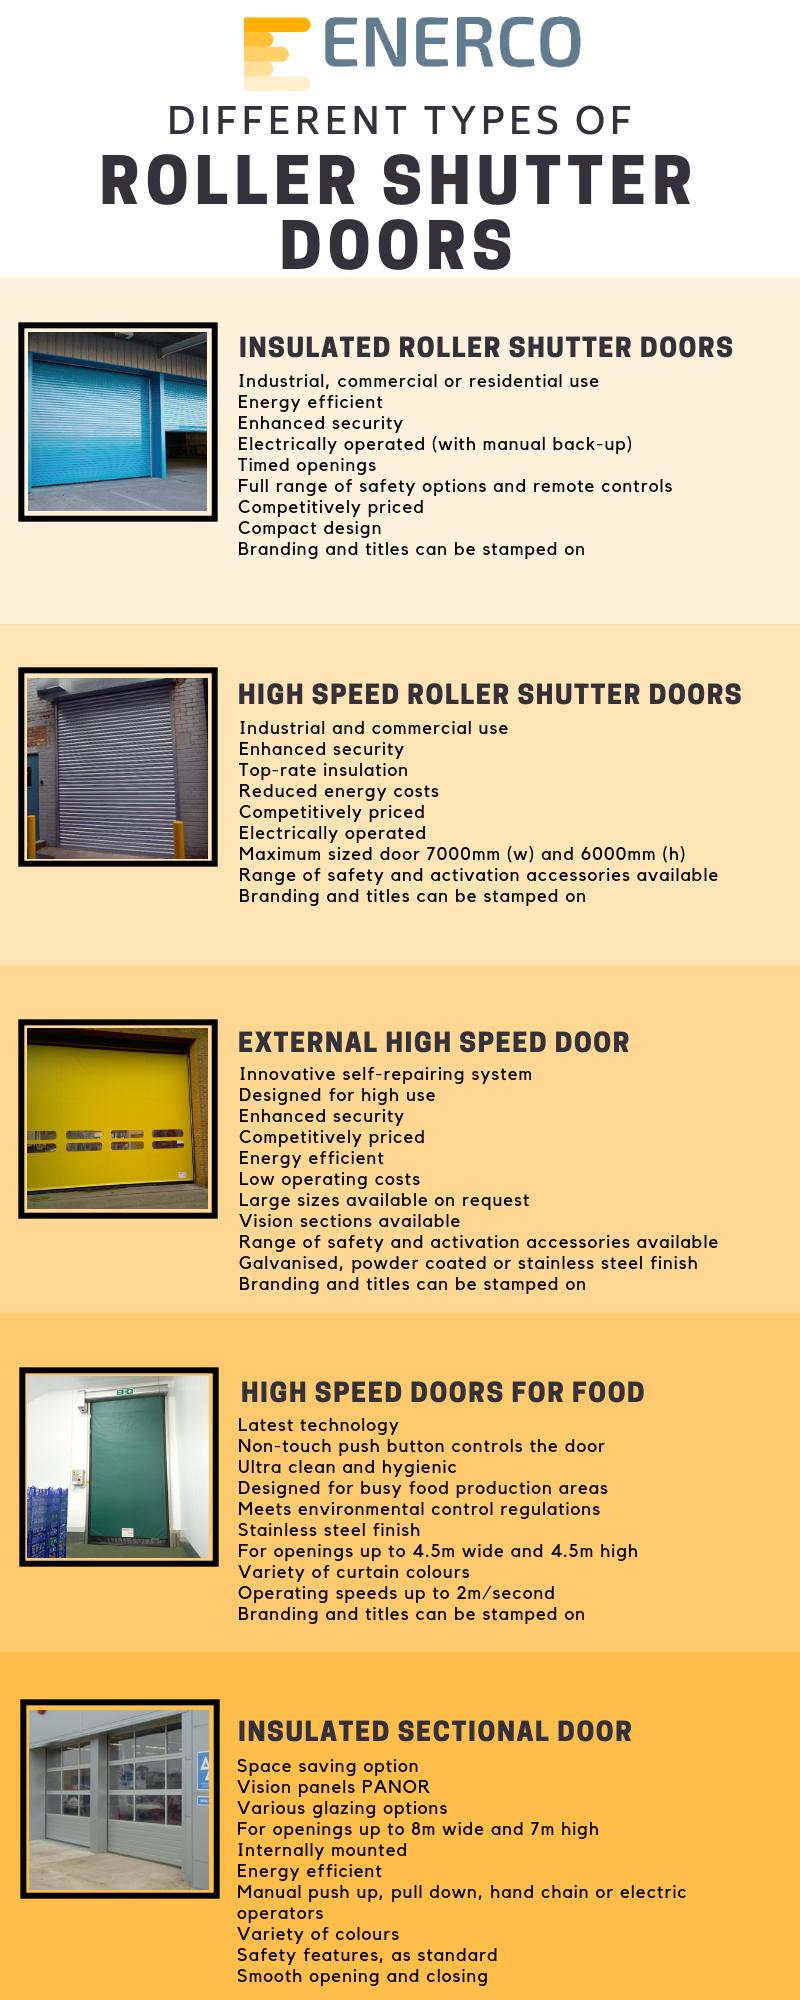 Different Types of Roller Shutter Doors